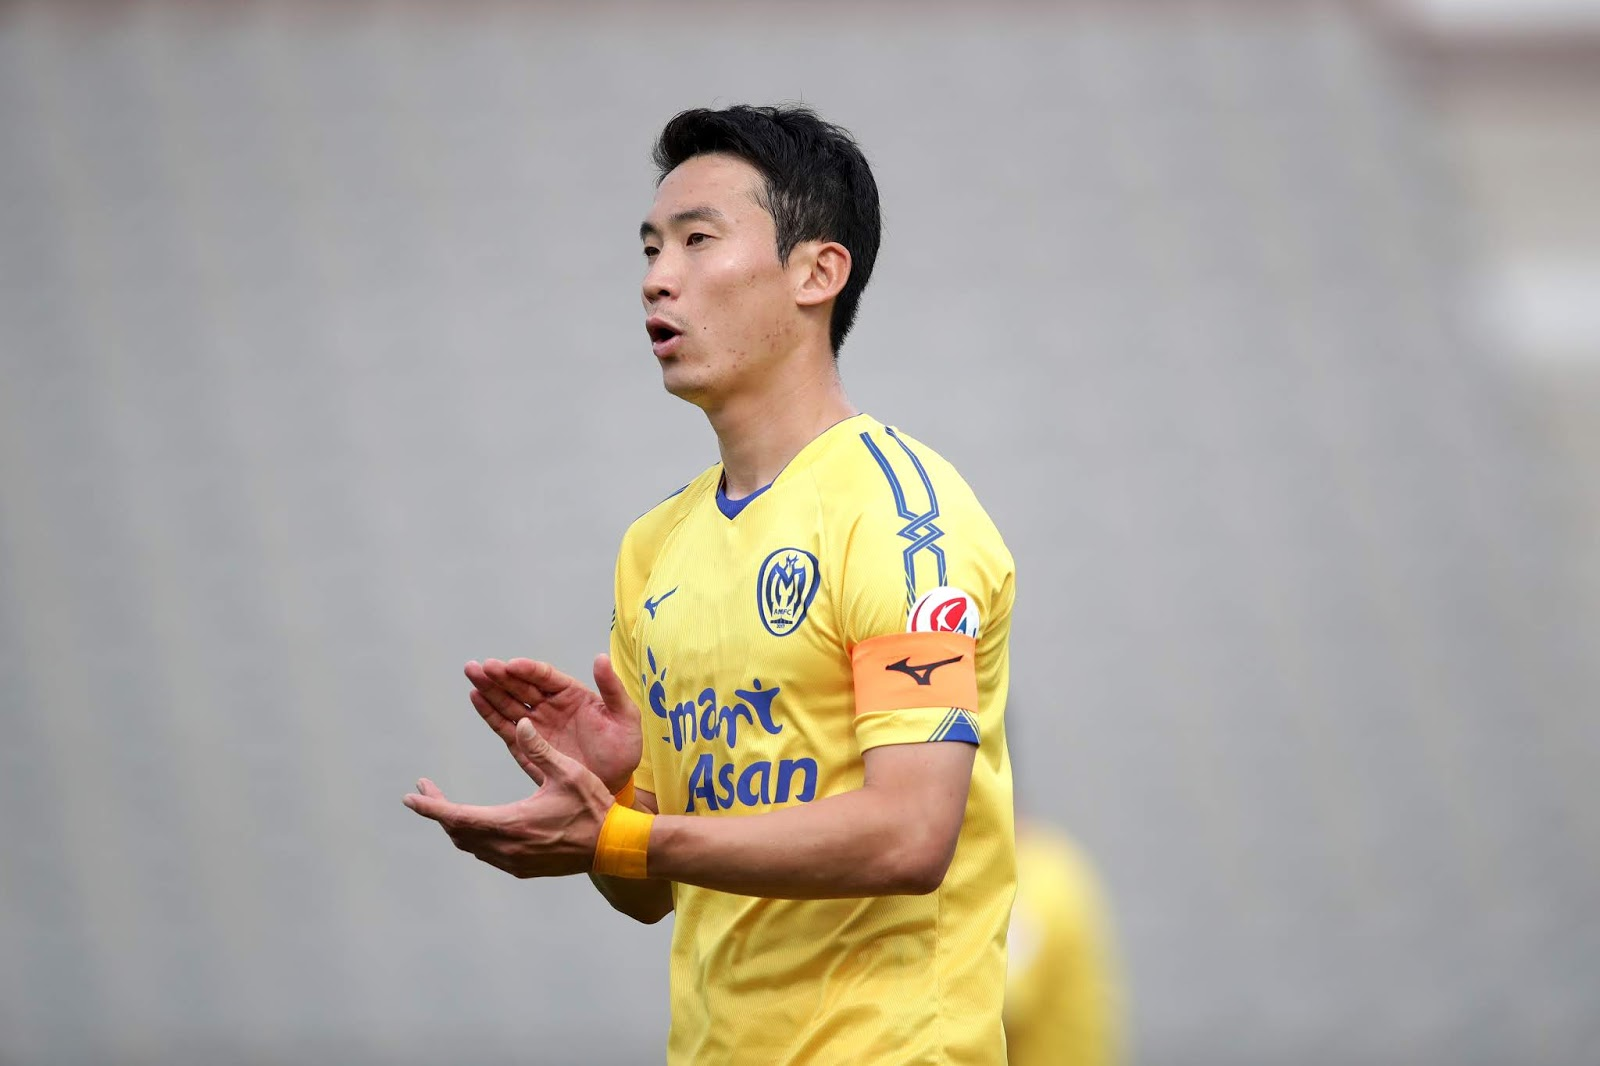 Preview: Asan Mugunghwa vs Daejeon Citizen K League 2 Round 16